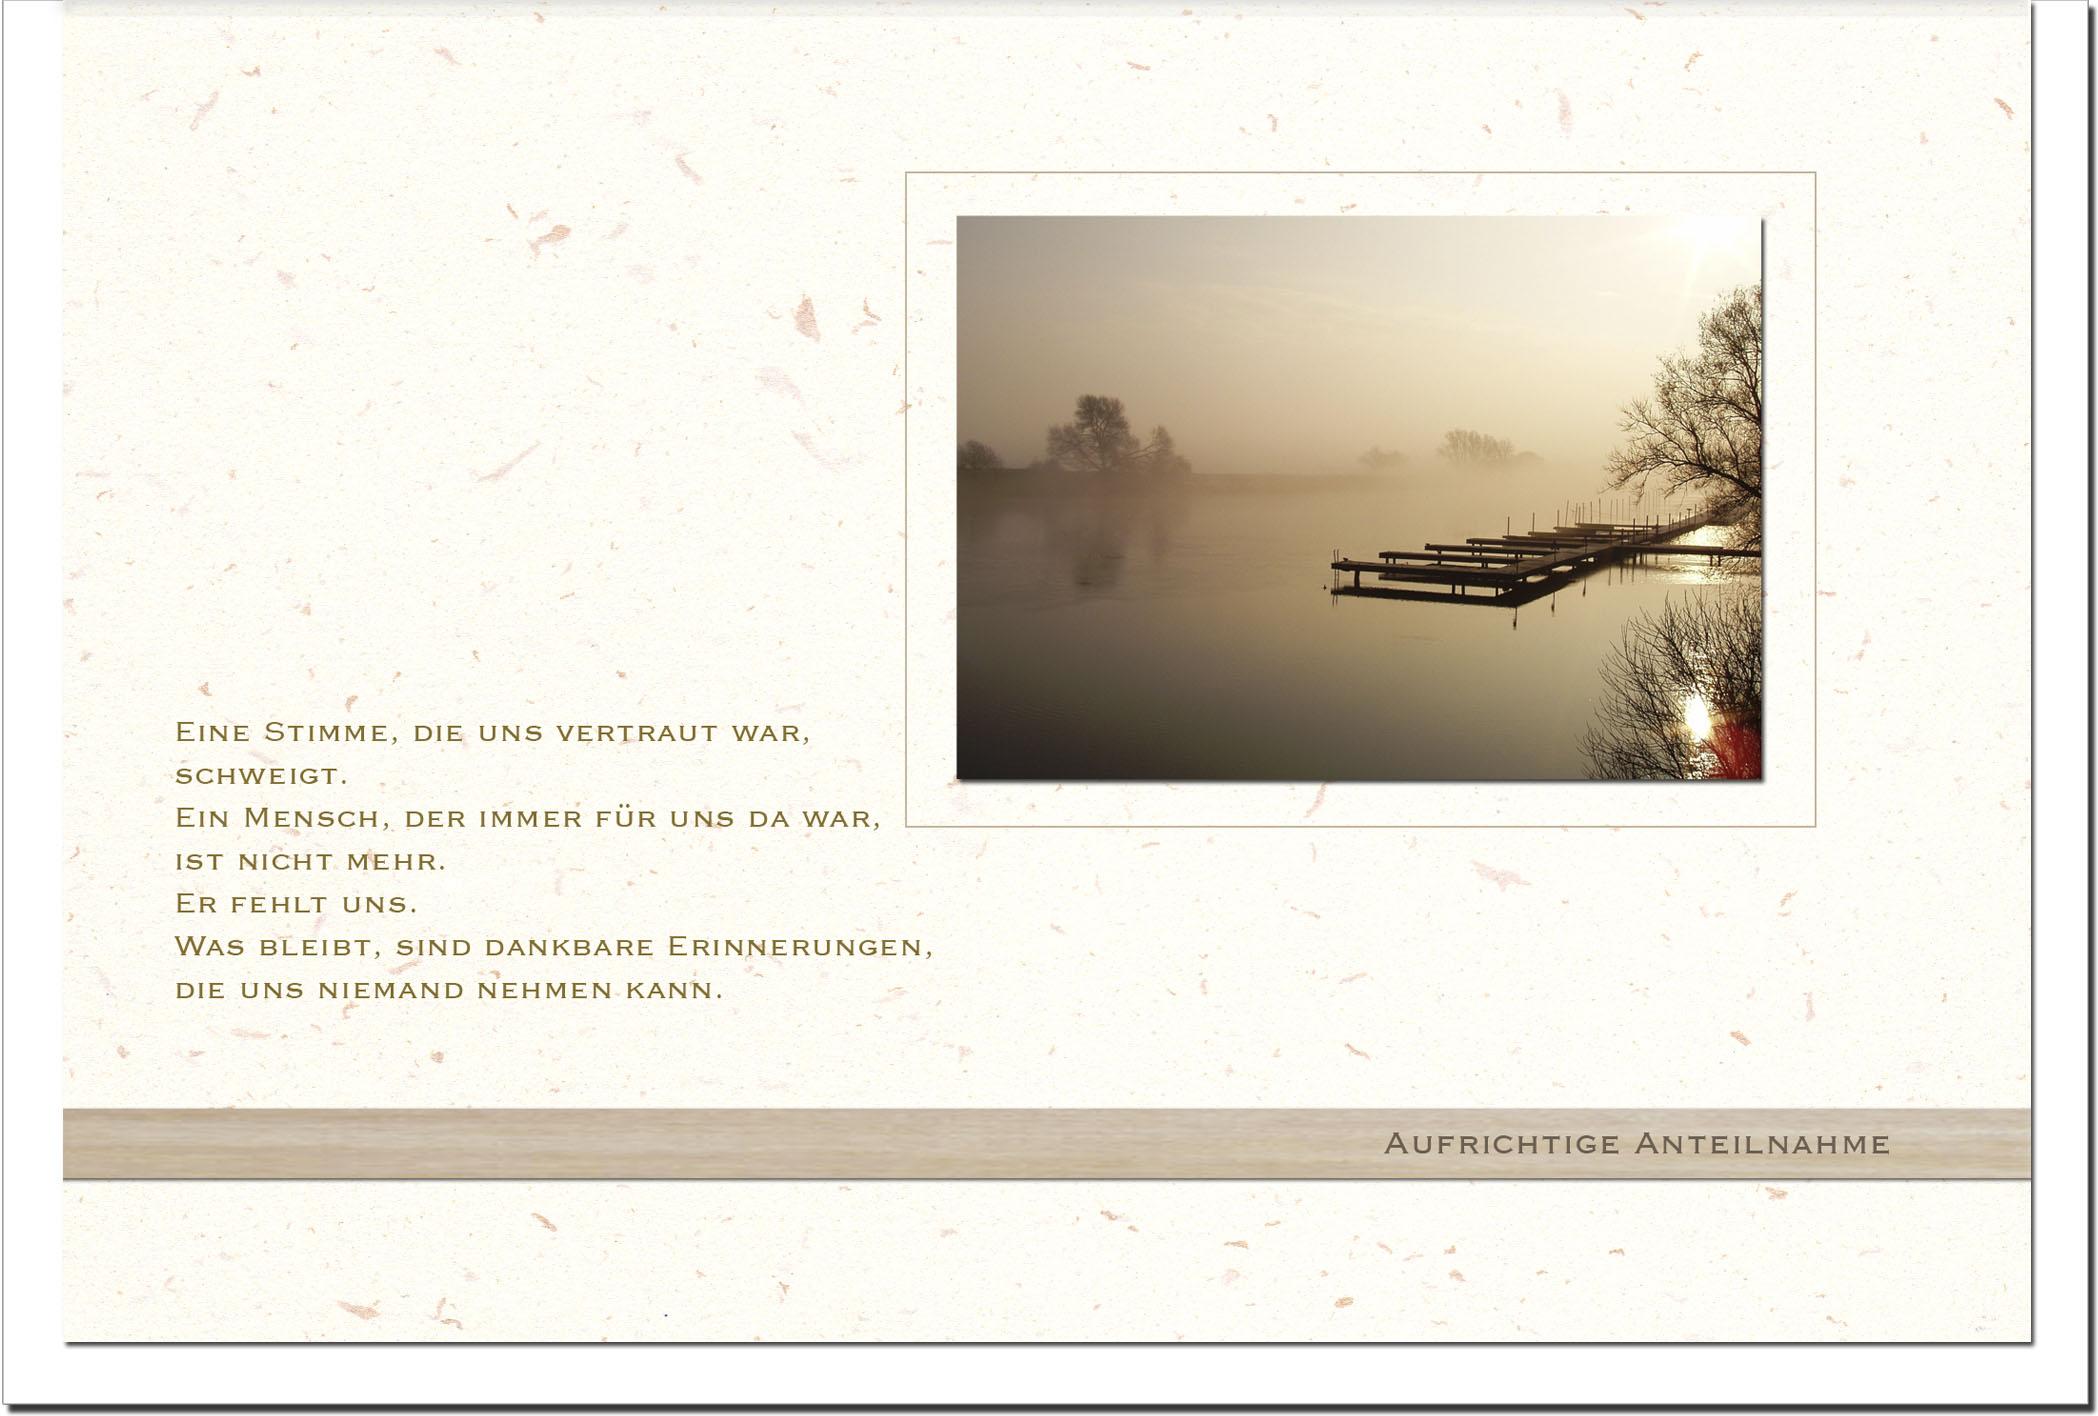 Kondolenzkarte ERINNERUNG | Steg im Nebel | metALUm #00561